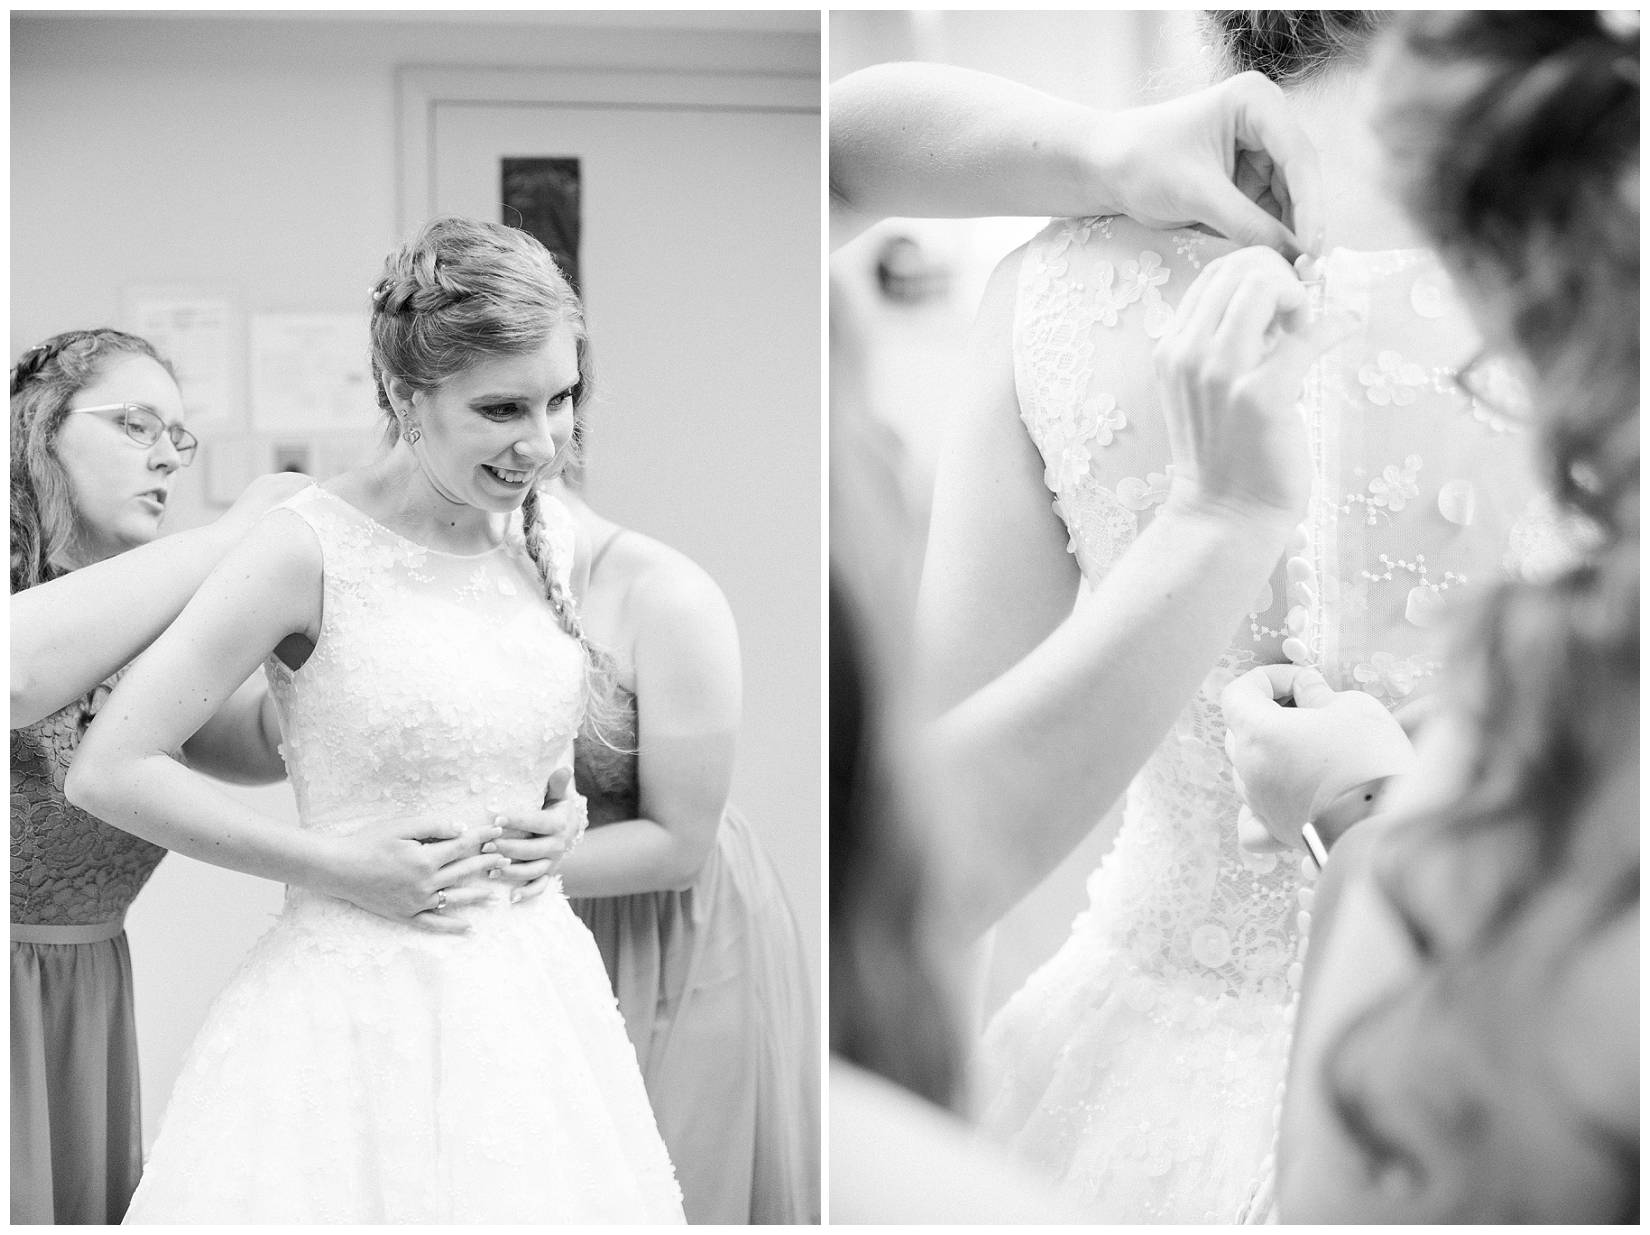 cat-alkire-wedding-photographer-indiana-chicago-indianapolis-fort-wayne_1297.jpg